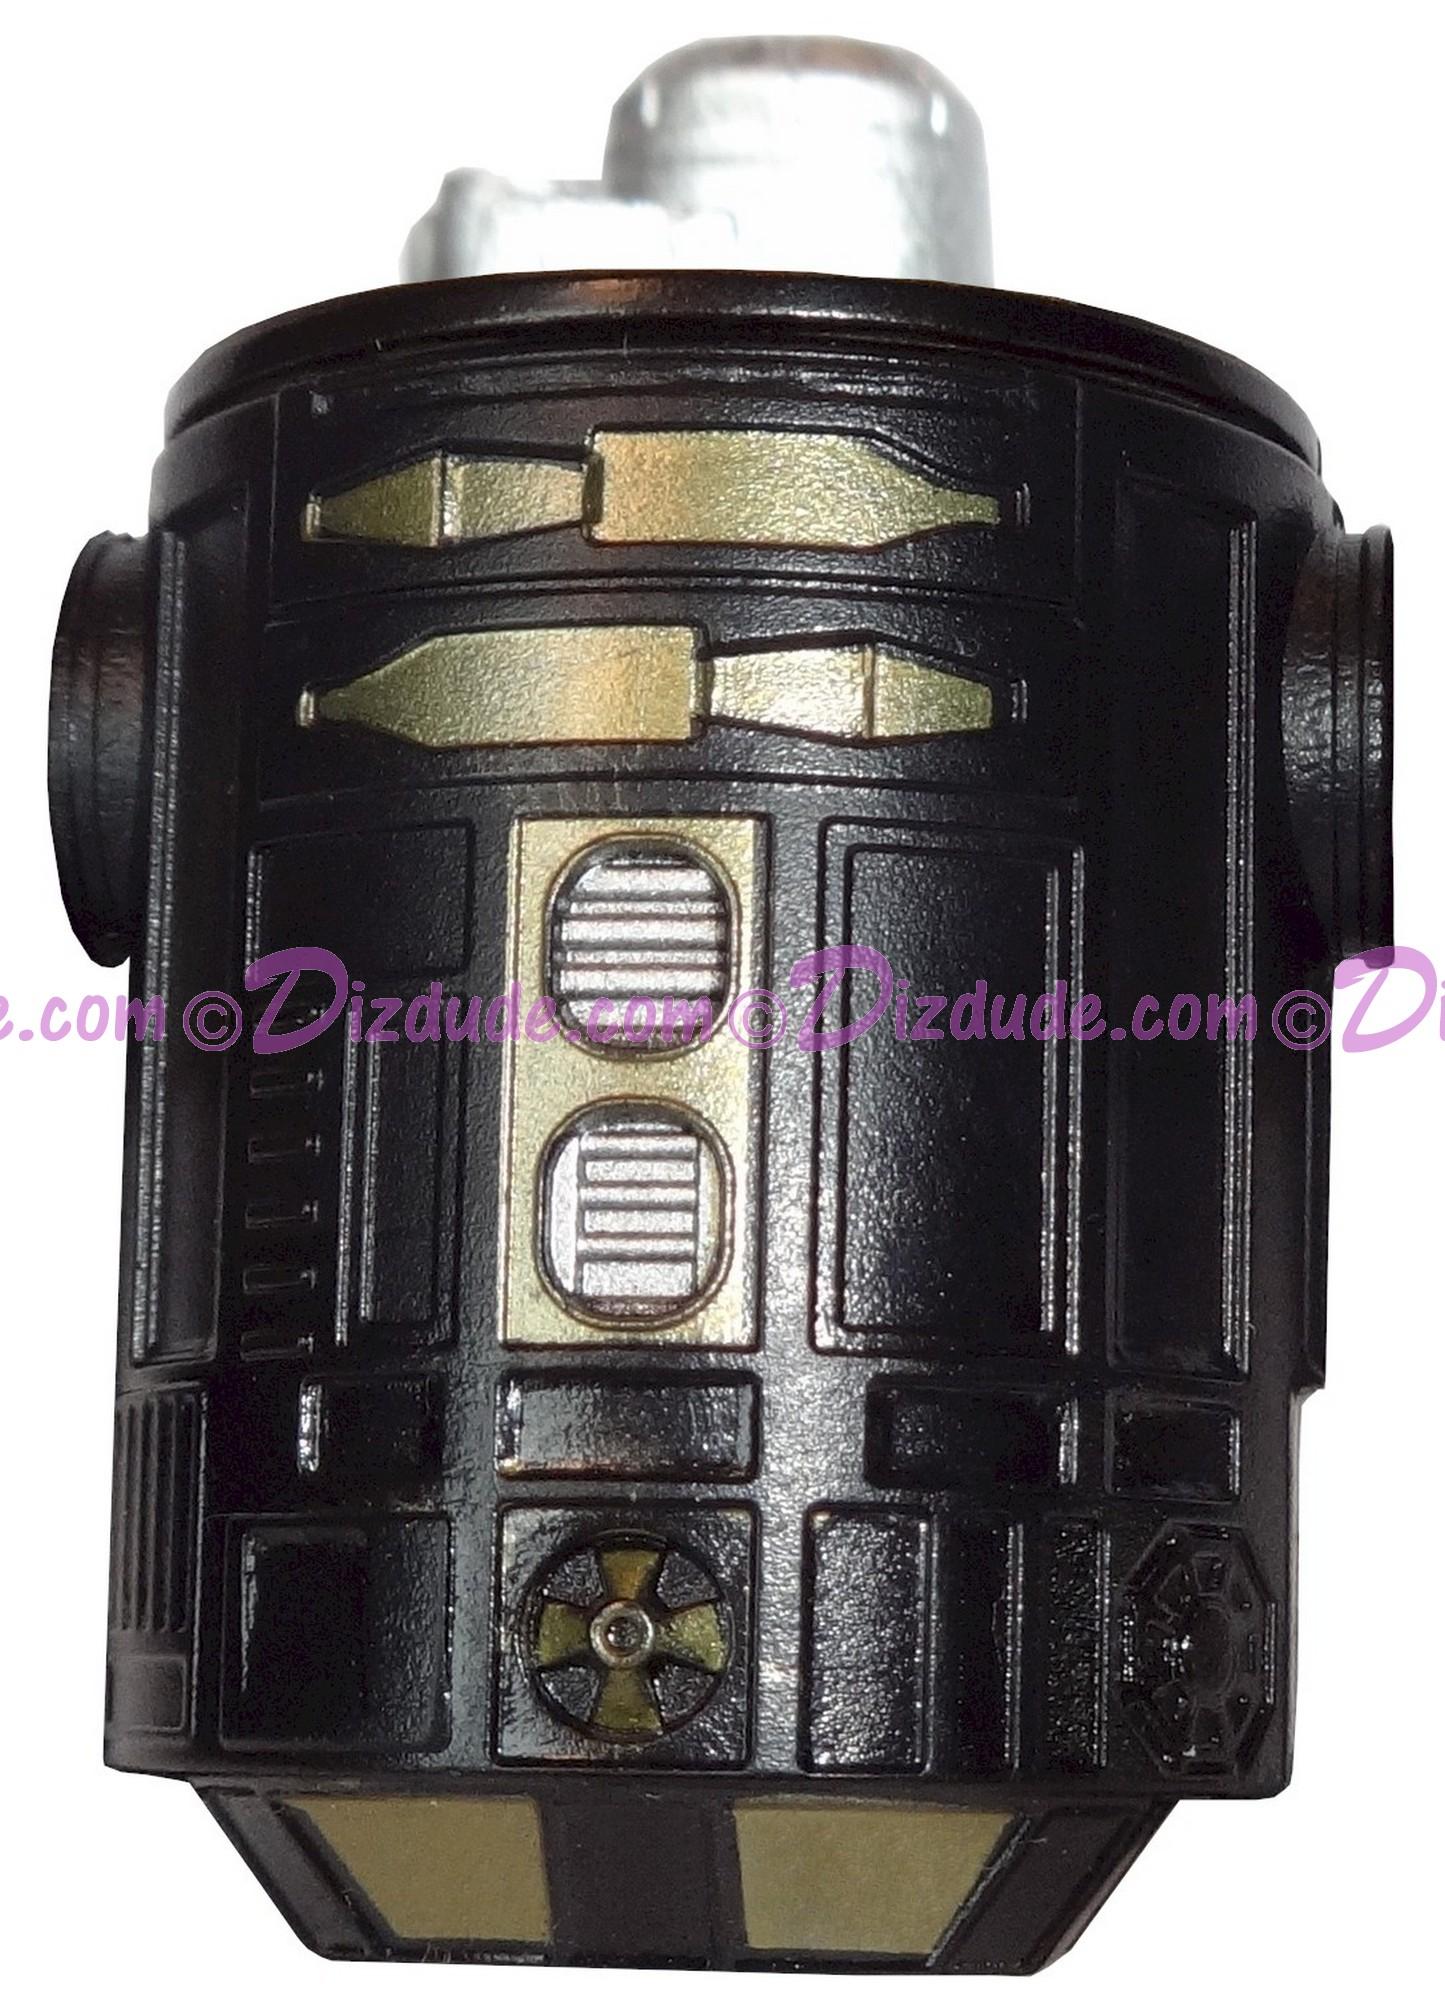 Black & Gold Astromech Droid Body ~ Series 2 from Disney Star Wars Build-A-Droid Factory © Dizdude.com